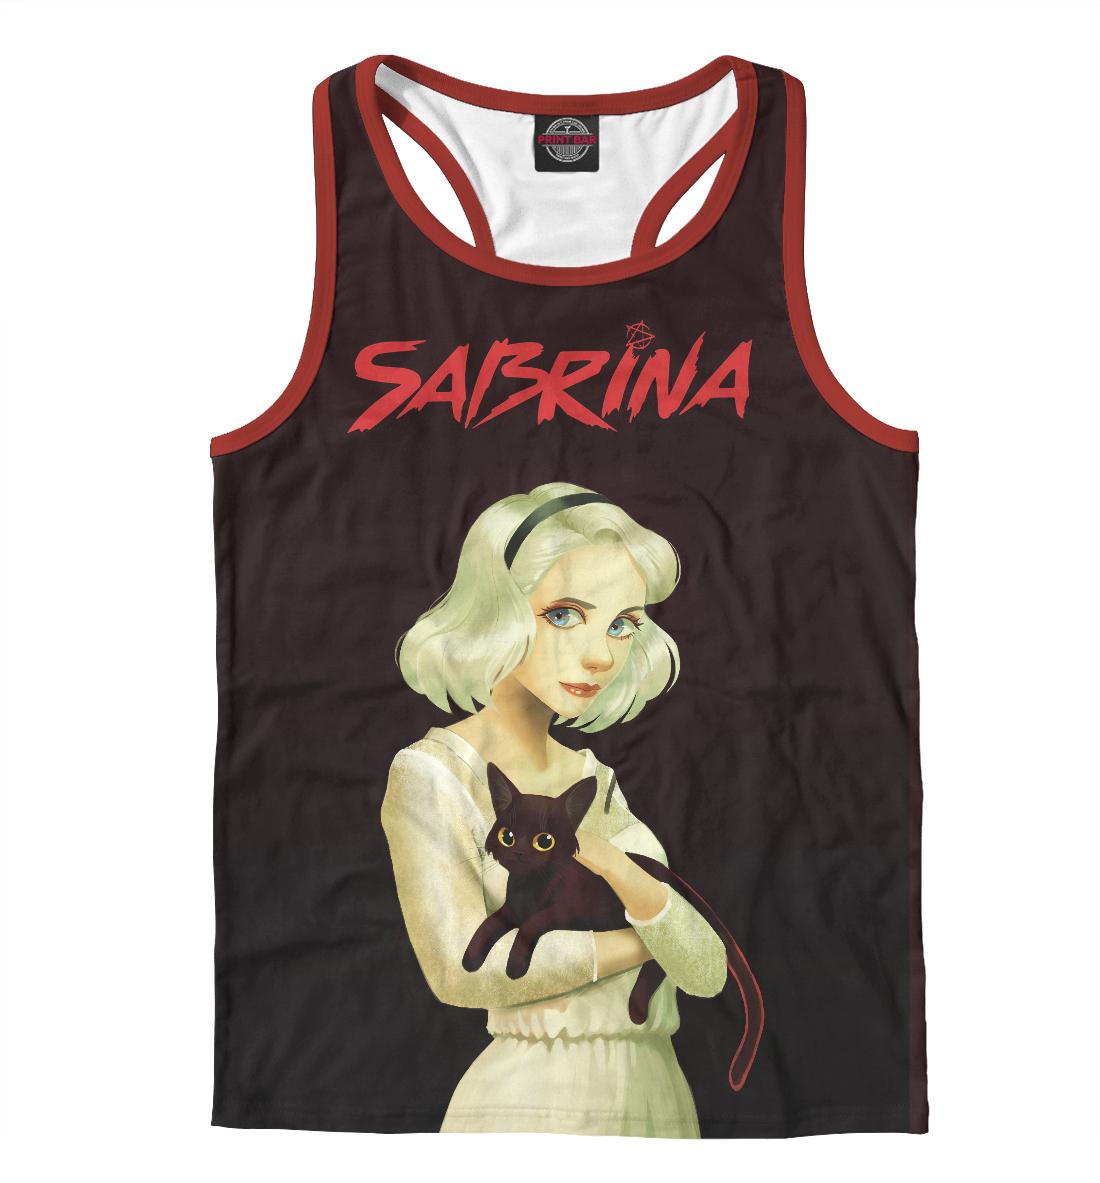 Купить Сабрина, Printbar, Майки борцовки, SOT-728901-mayb-2